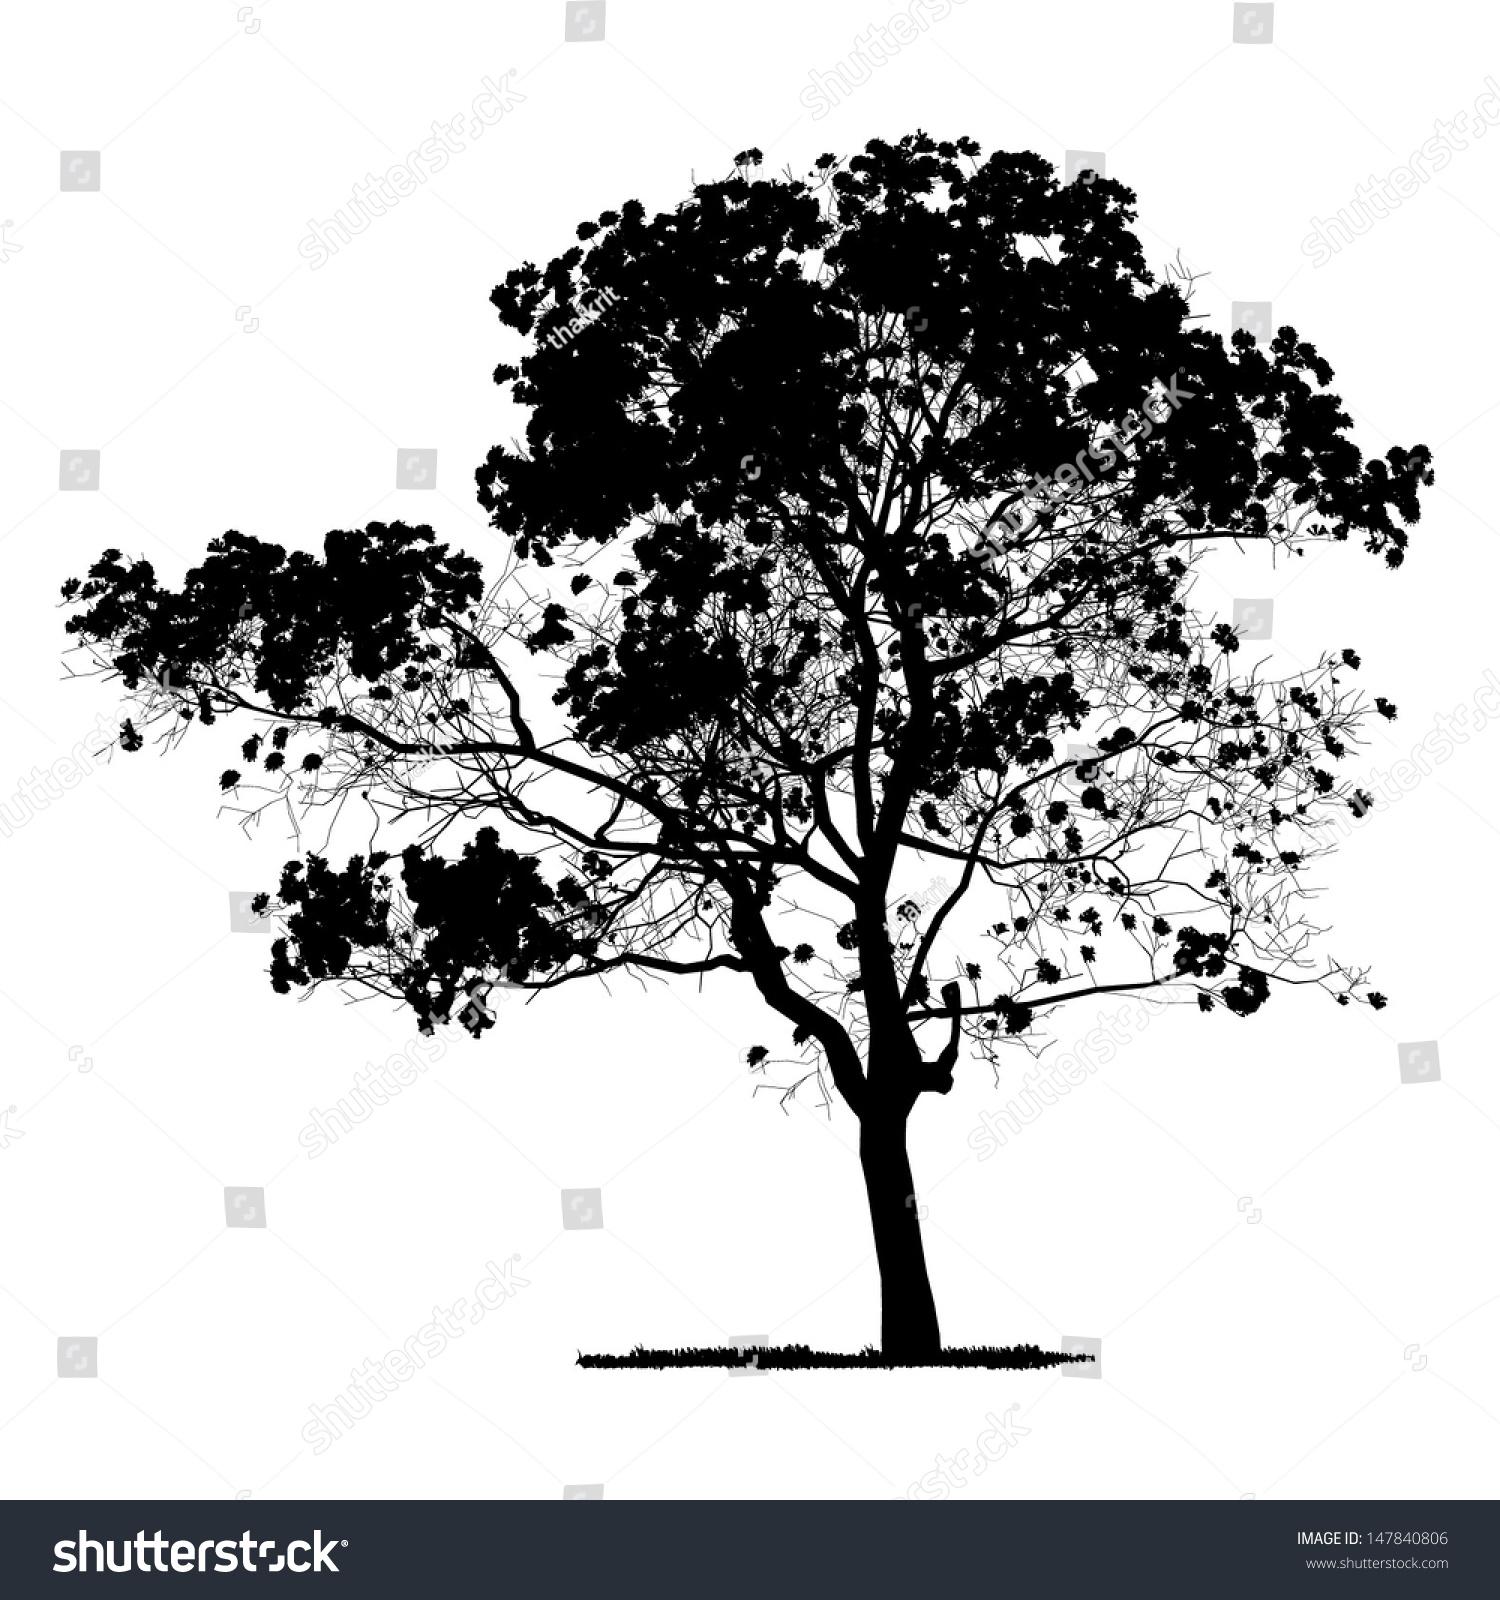 Vector Drawing Tree Detailed Vector Stock-Vektorgrafik 147840806 ...